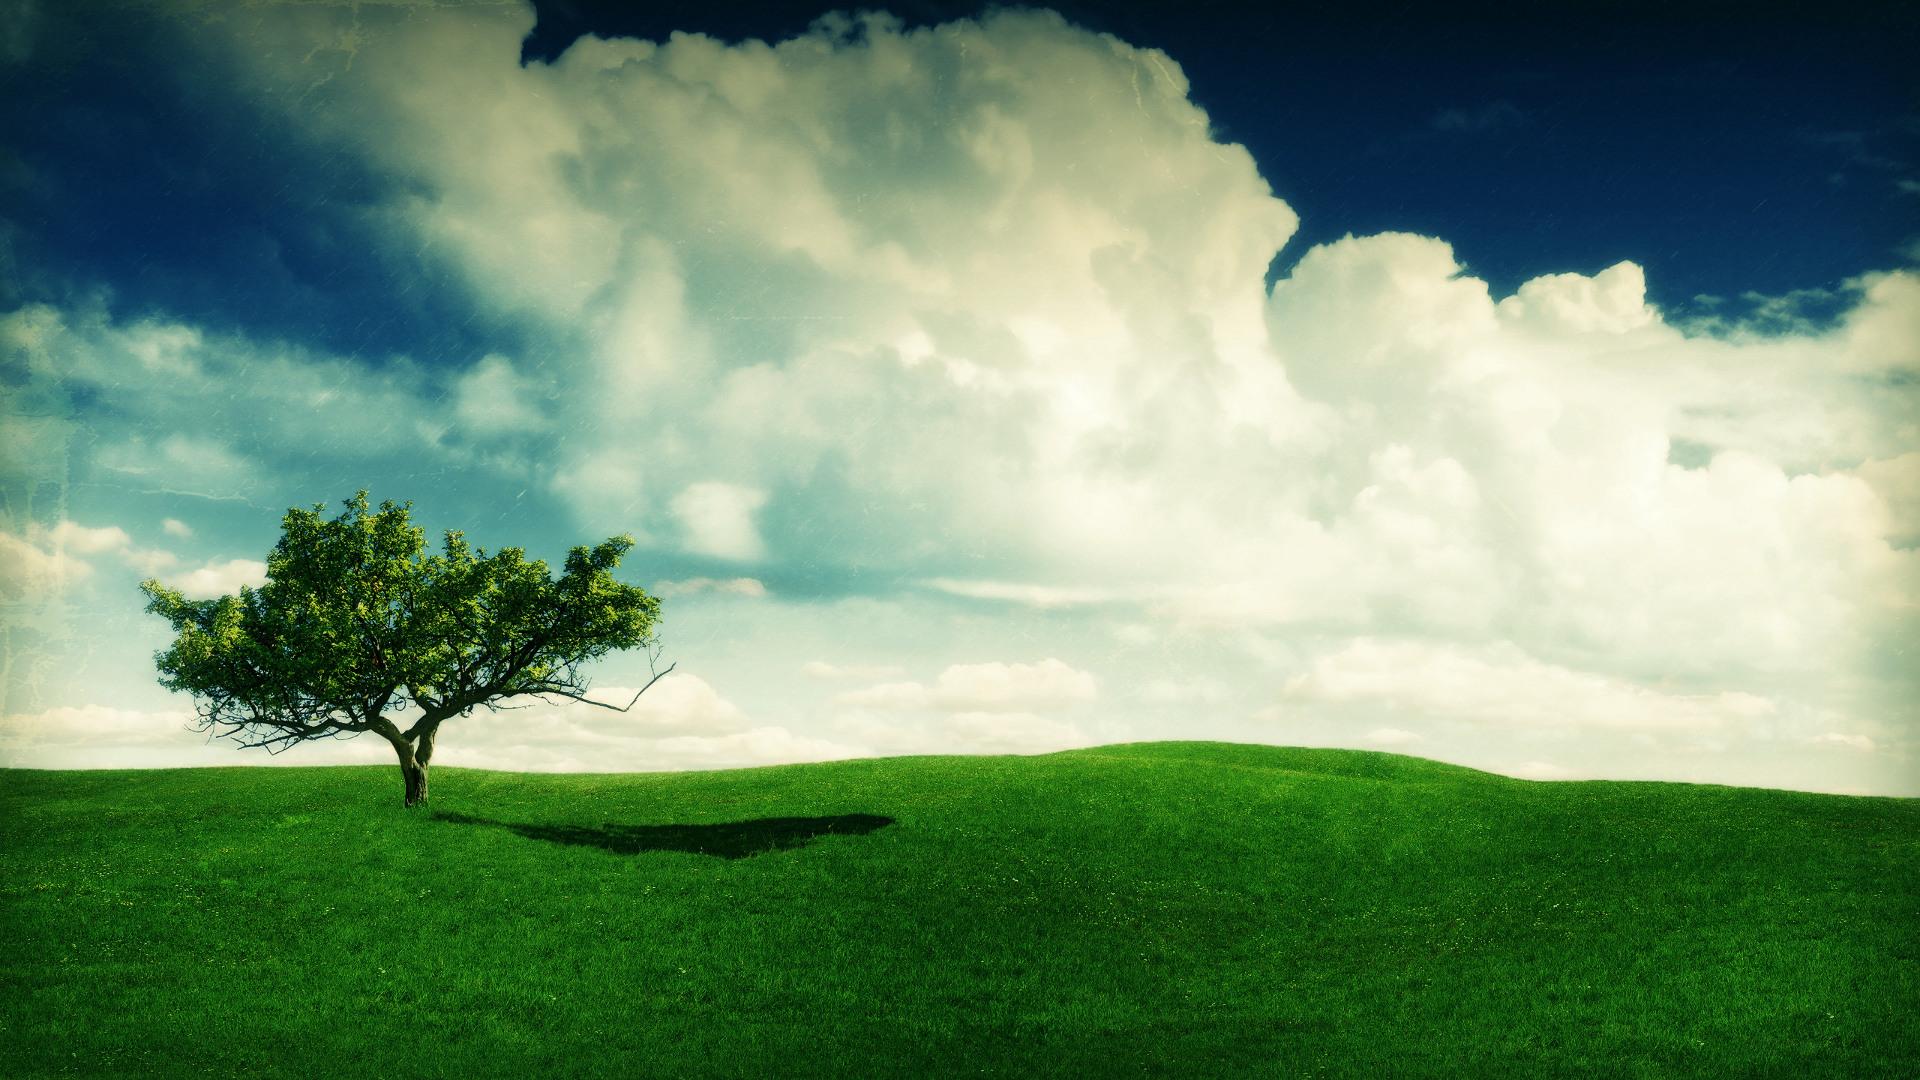 summer landscape image wallpaper - photo #39